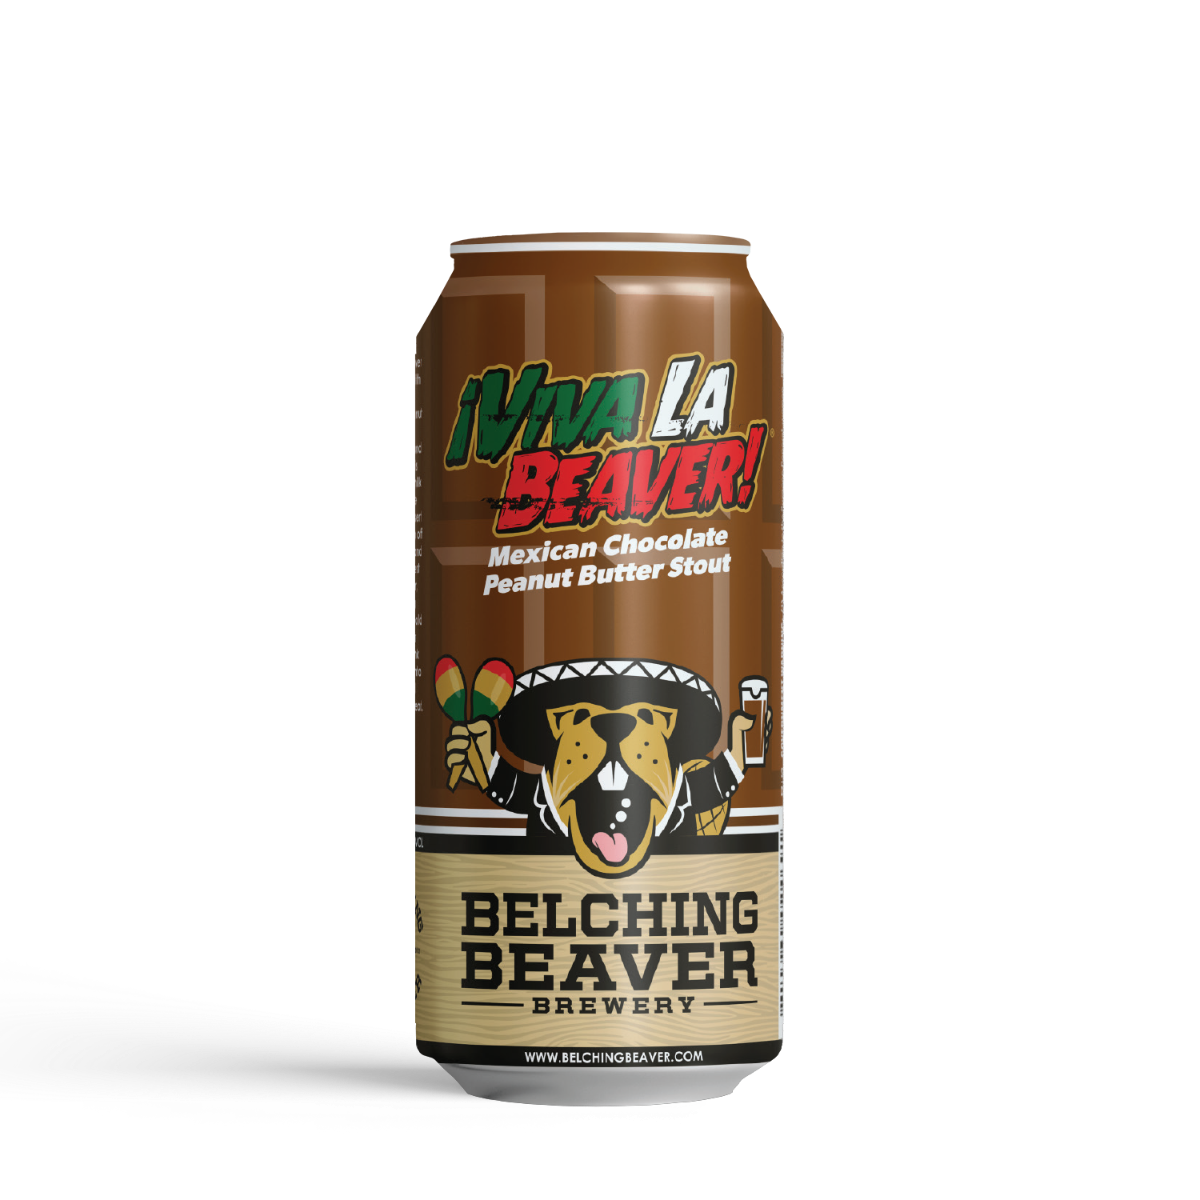 Belching Beaver Brewery - ¡Viva La Beaver!